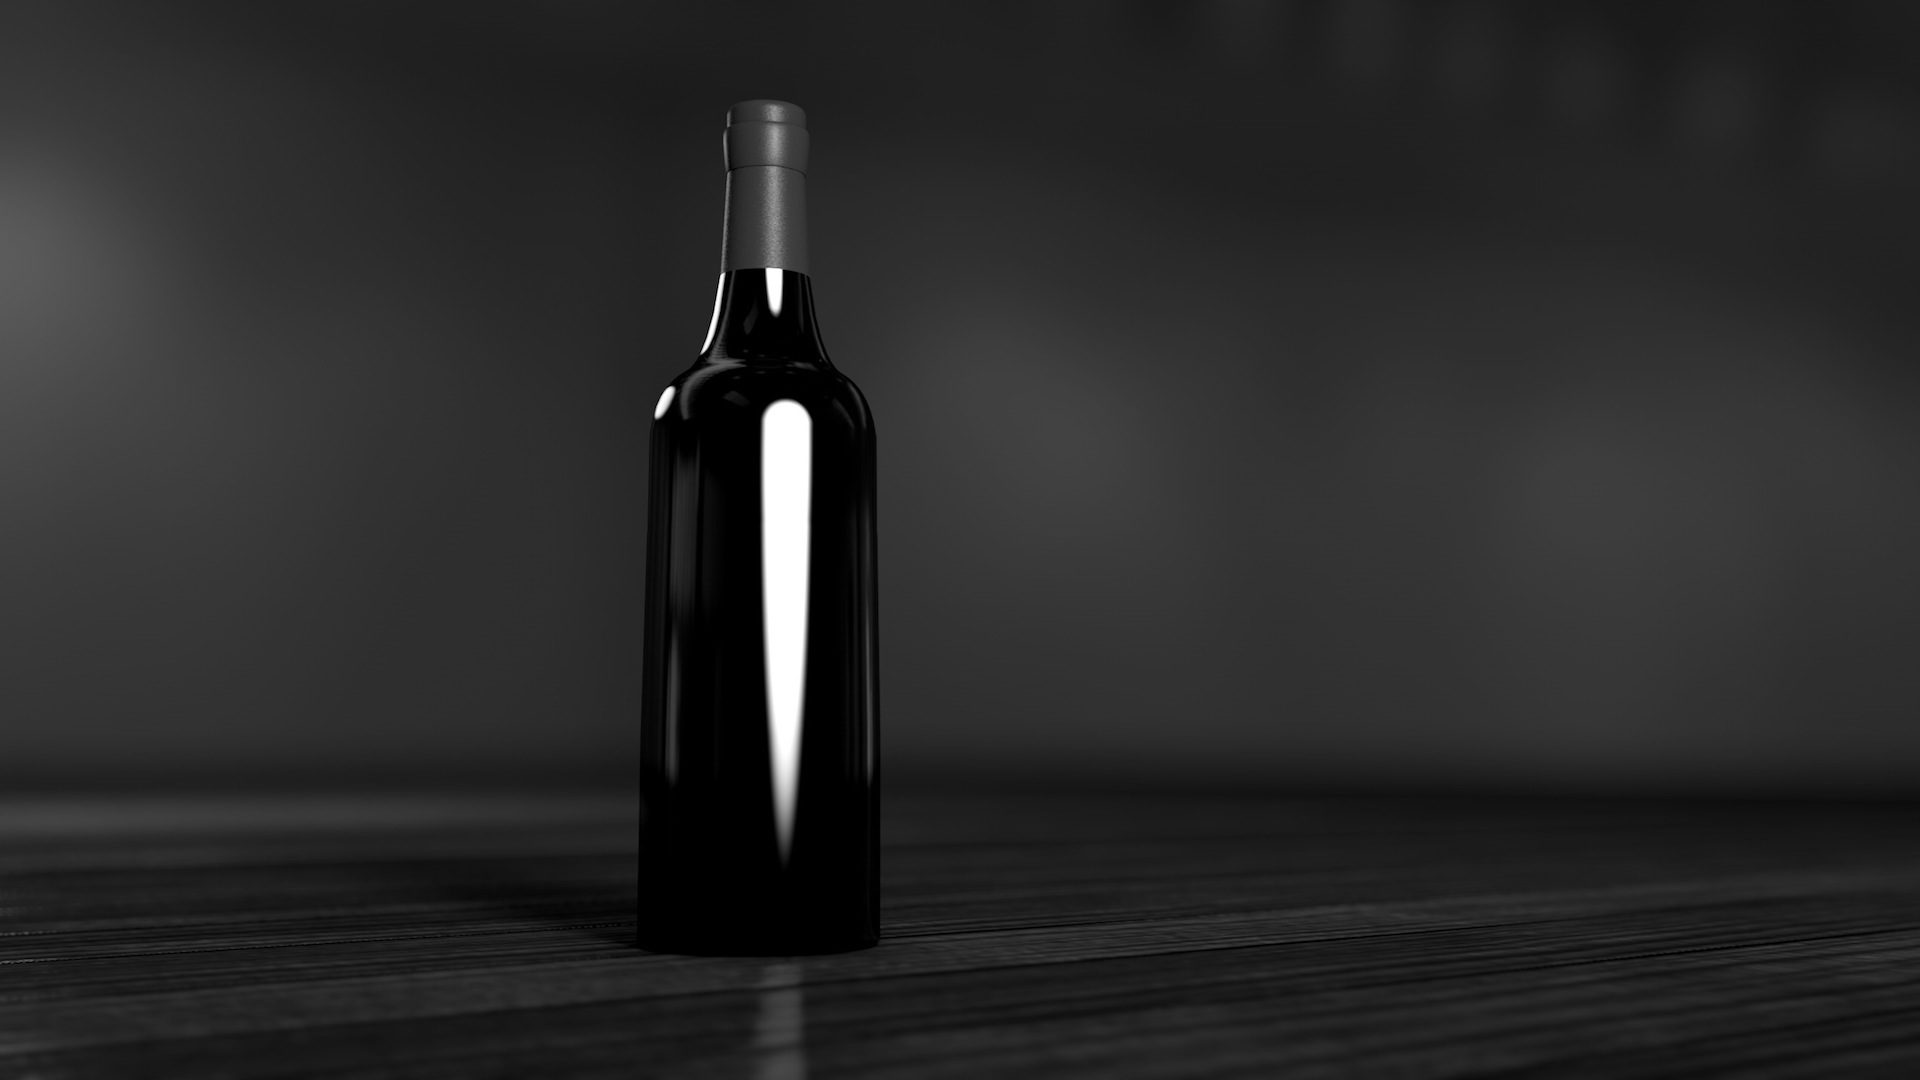 botella, vino, 极简主义者, 索莱达, 在黑色和白色 - 高清壁纸 - 教授-falken.com